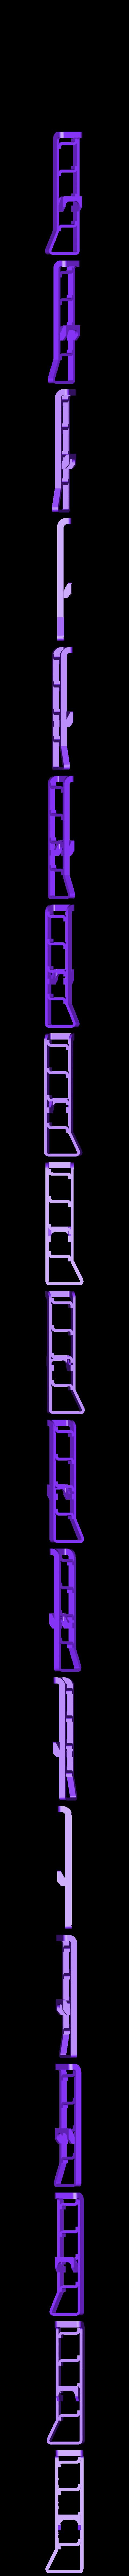 MirrorCab_Ladder.STL Download free STL file 4-8-8-4 Big Boy Locomotive • 3D printer object, RaymondDeLuca